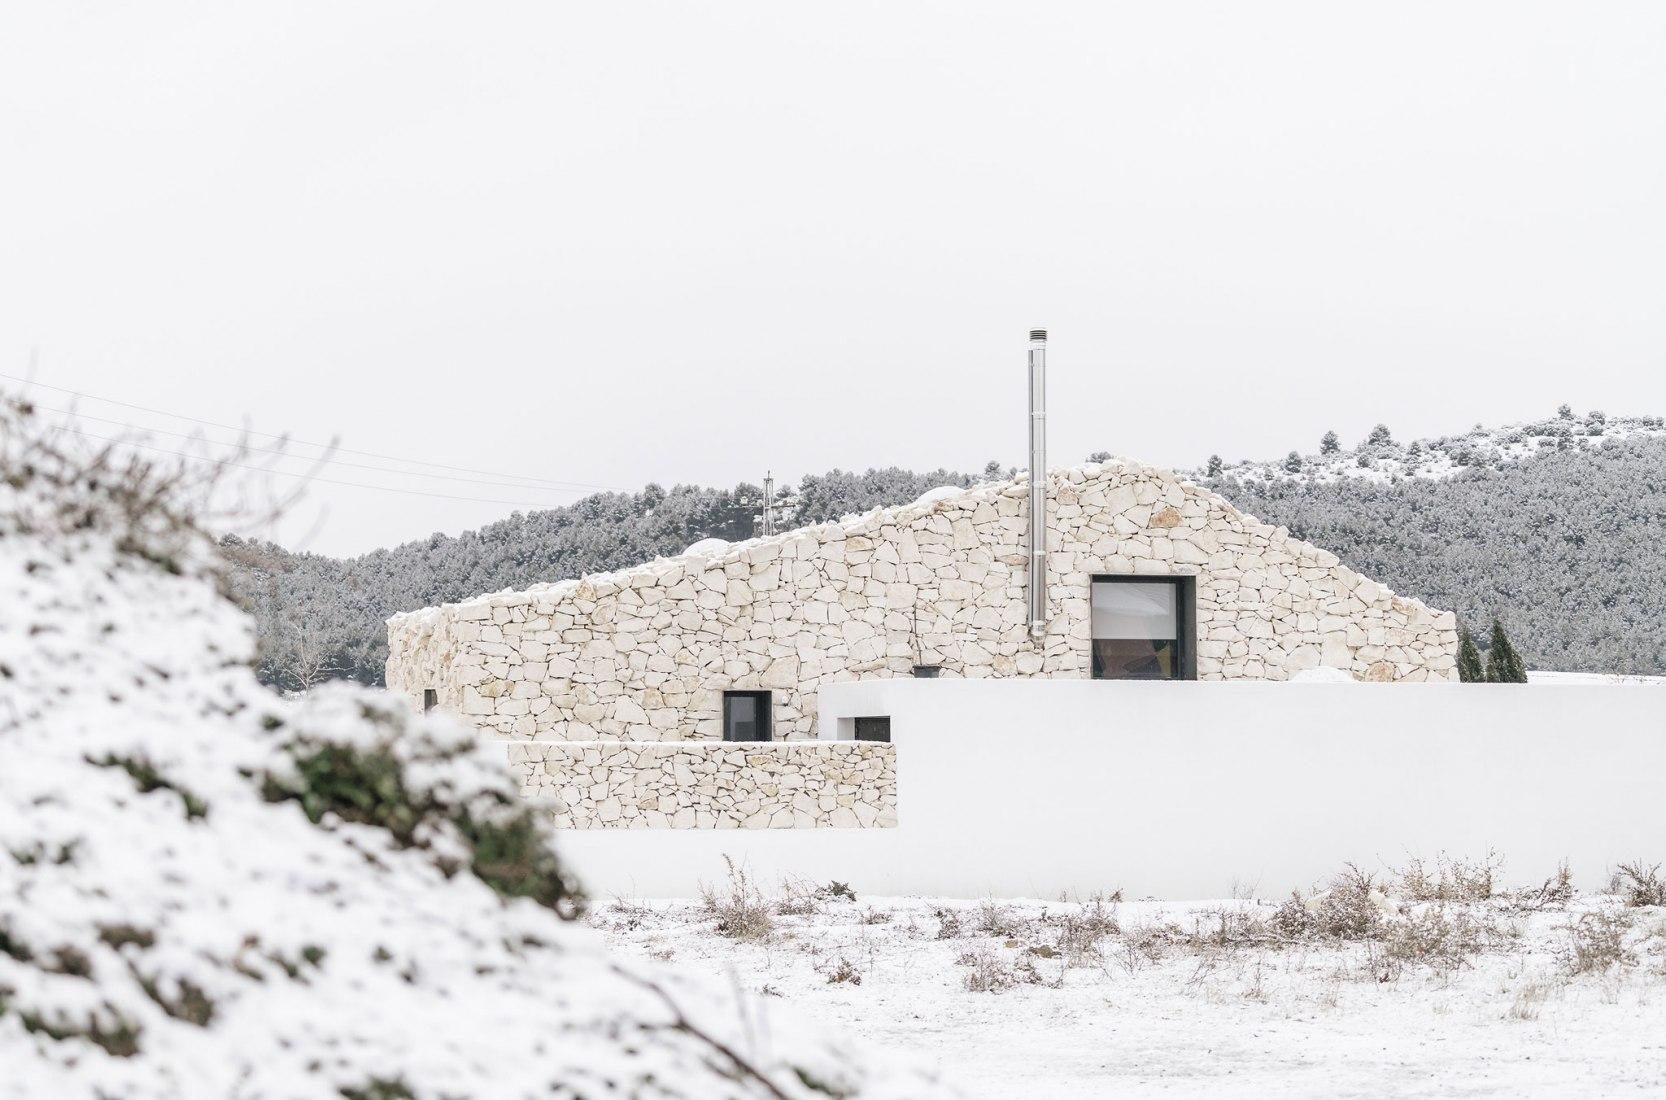 Casa Calixto por GRX Arquitectos. Fotografía por Imagen Subliminal.